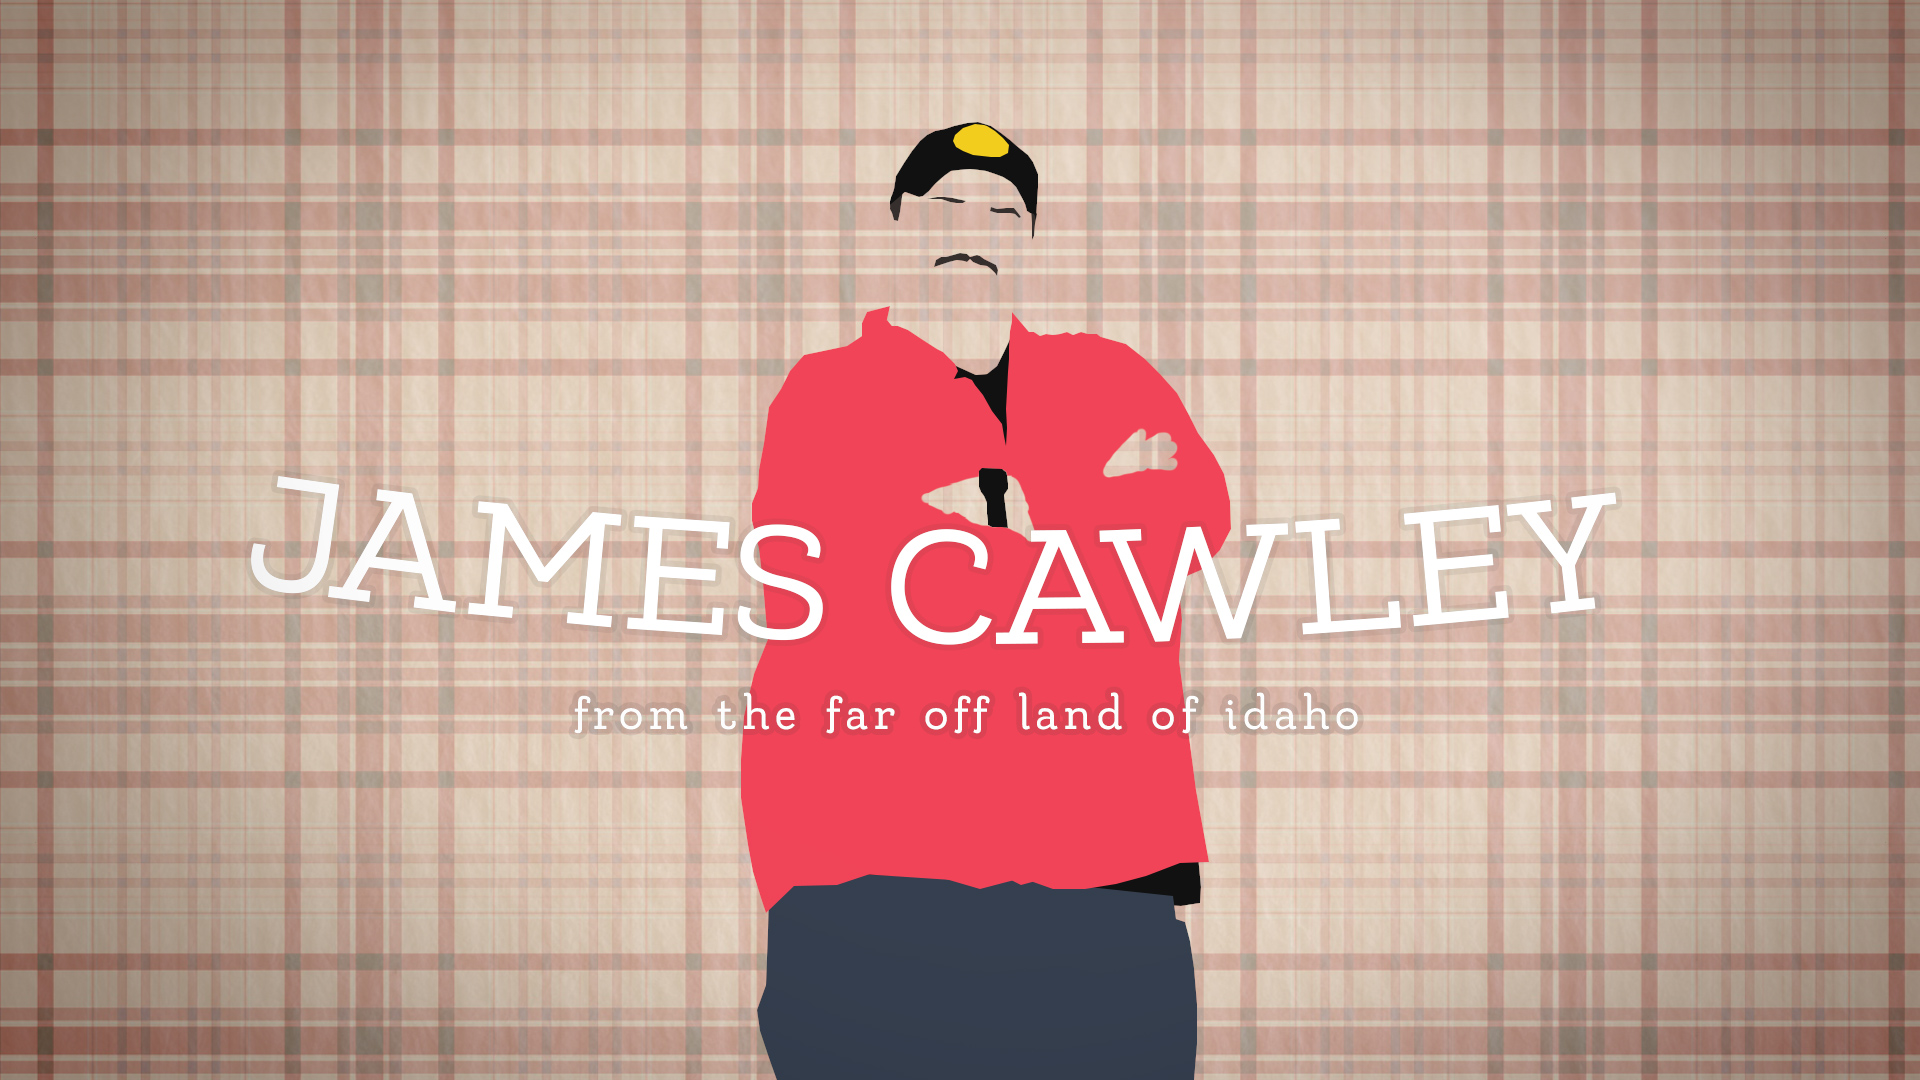 JAMES CAWLEY FINAL.jpg